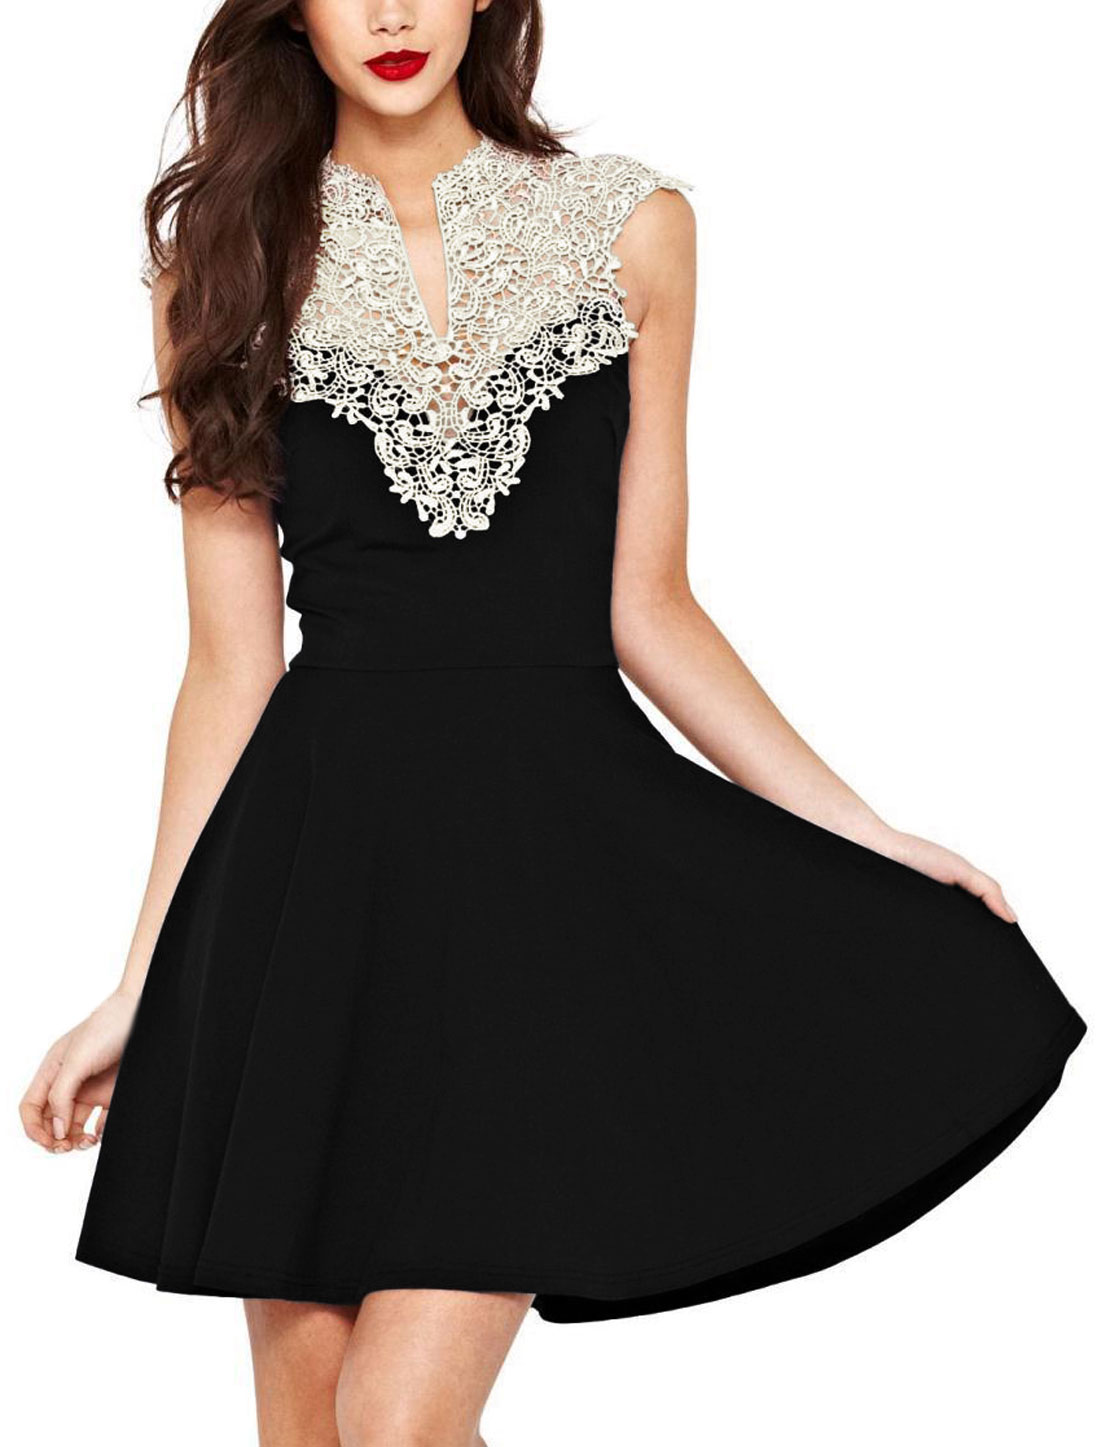 Woman Hollow Out Upper Crochet Design Split Neck Sleeveless Panel Dress Black M